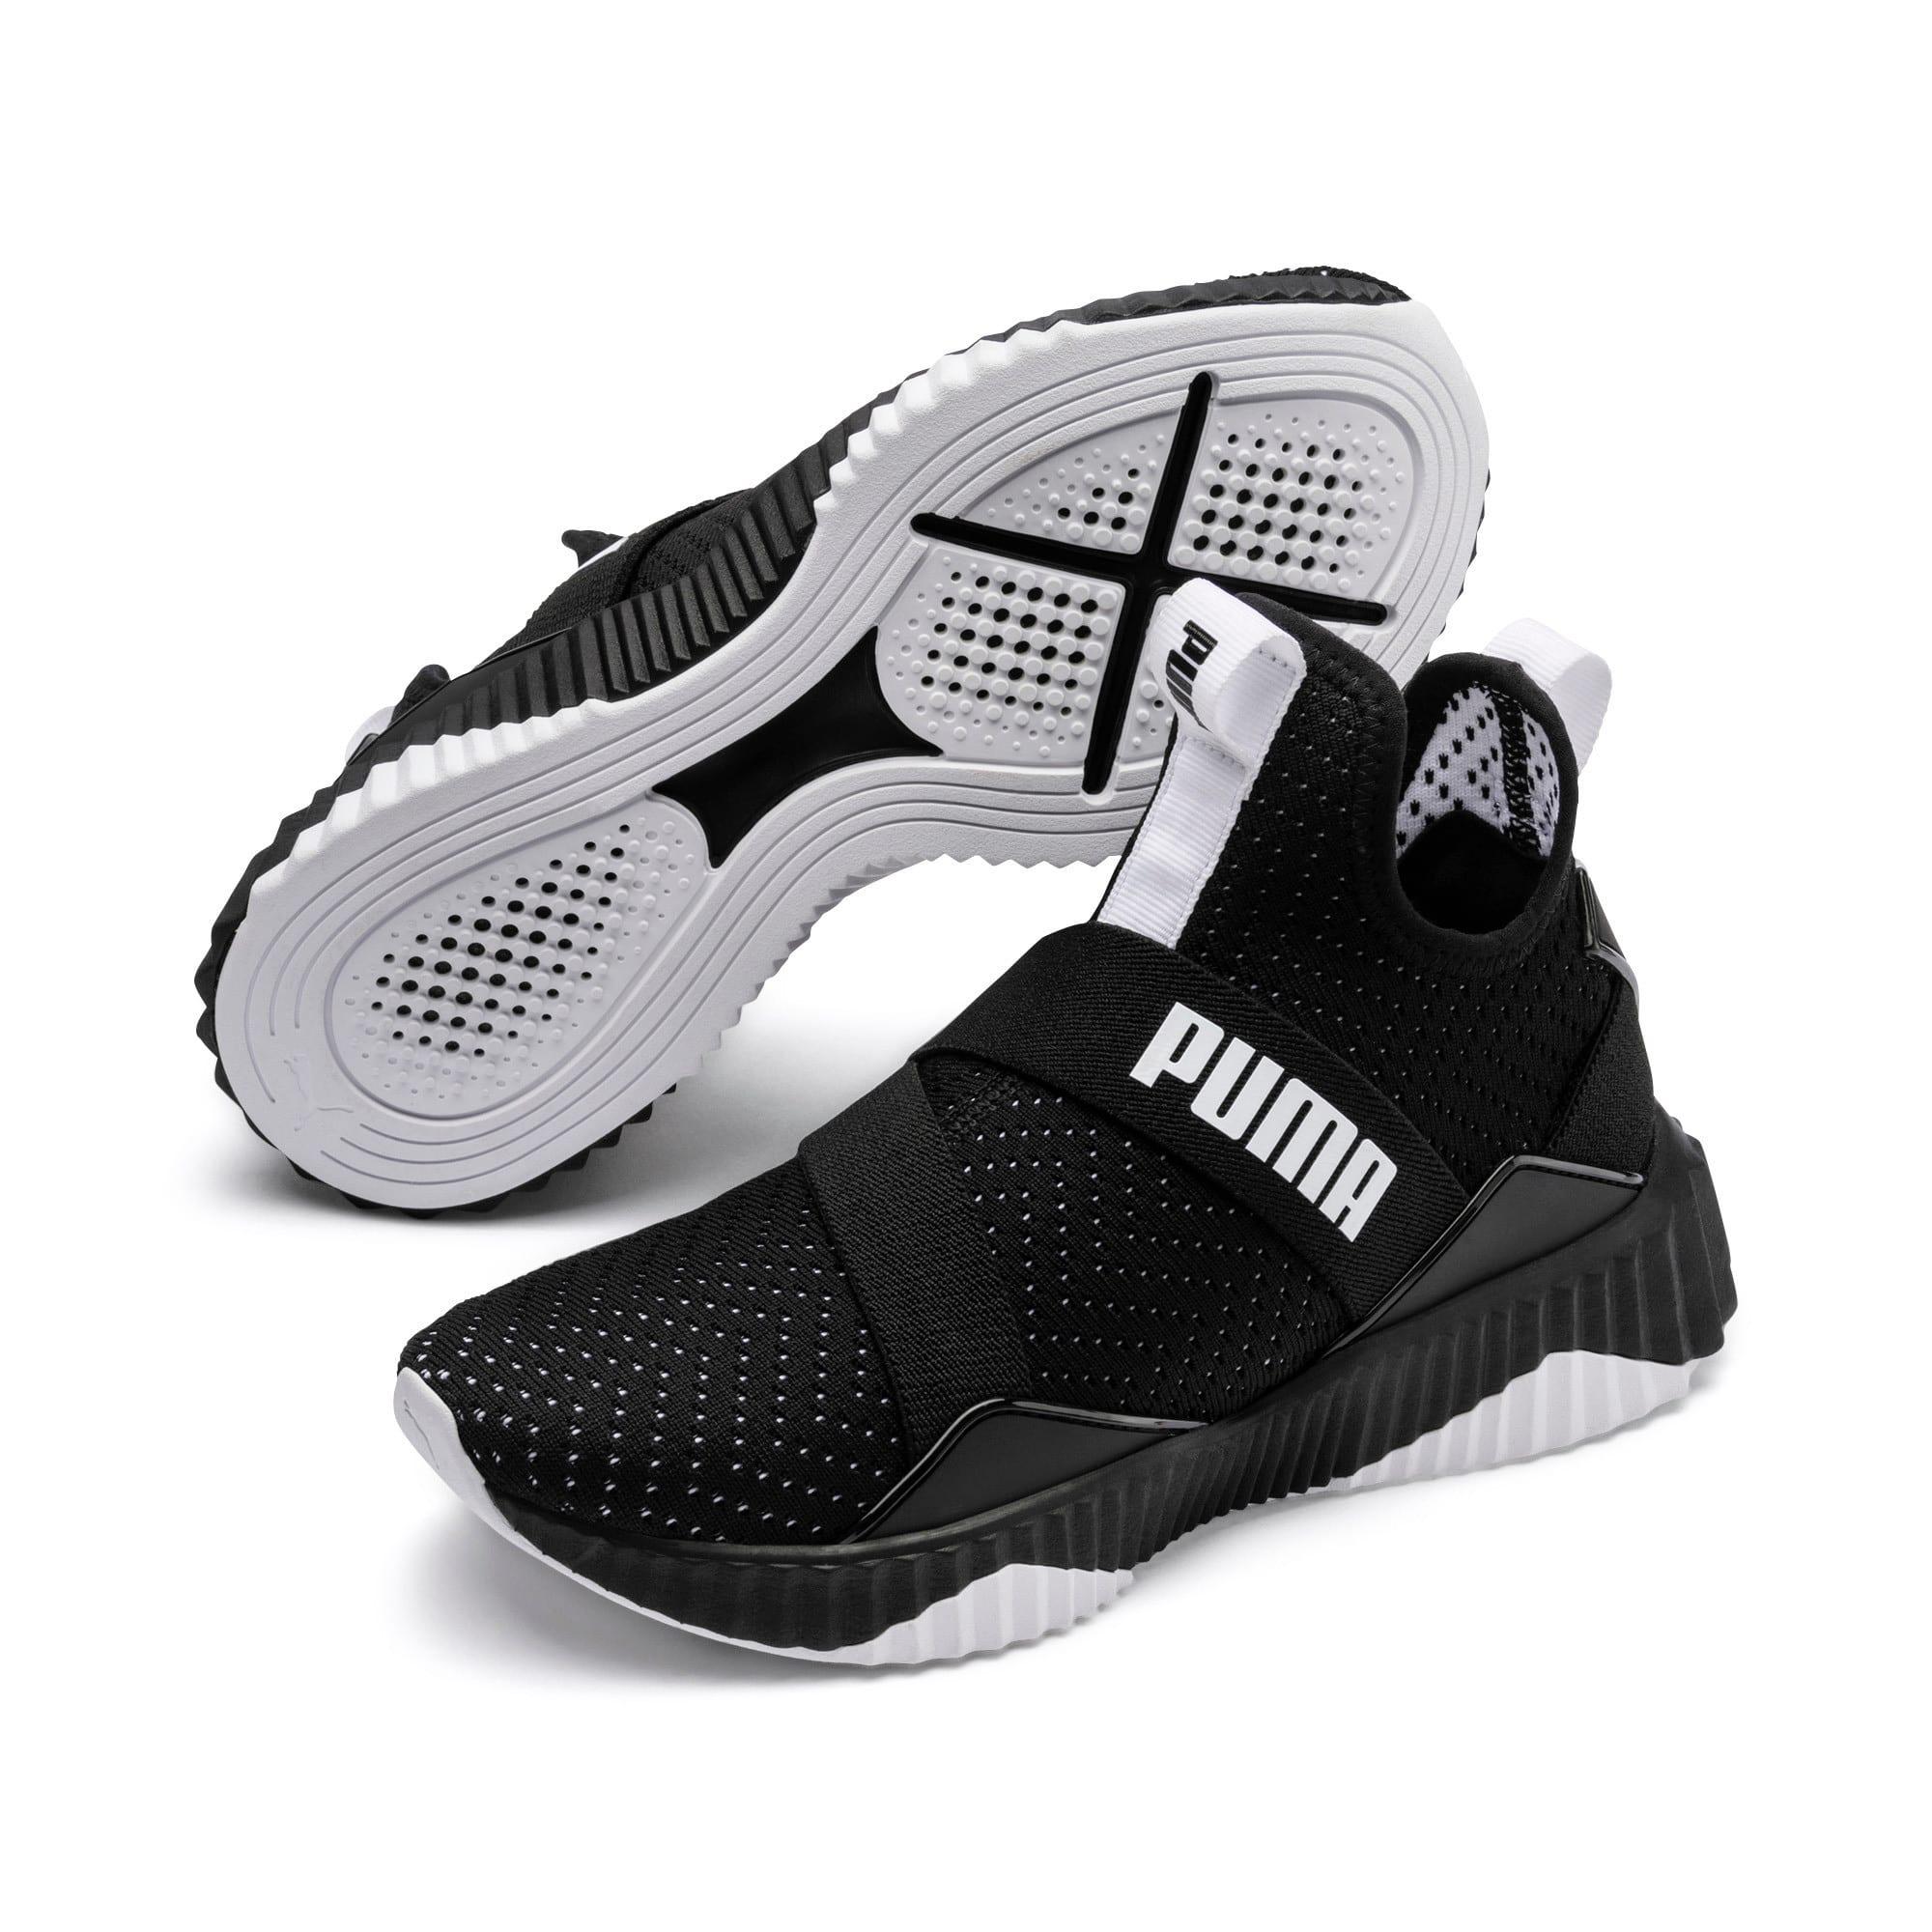 Thumbnail 3 of Defy Mid Core Women's Training Shoes, Puma Black-Puma White, medium